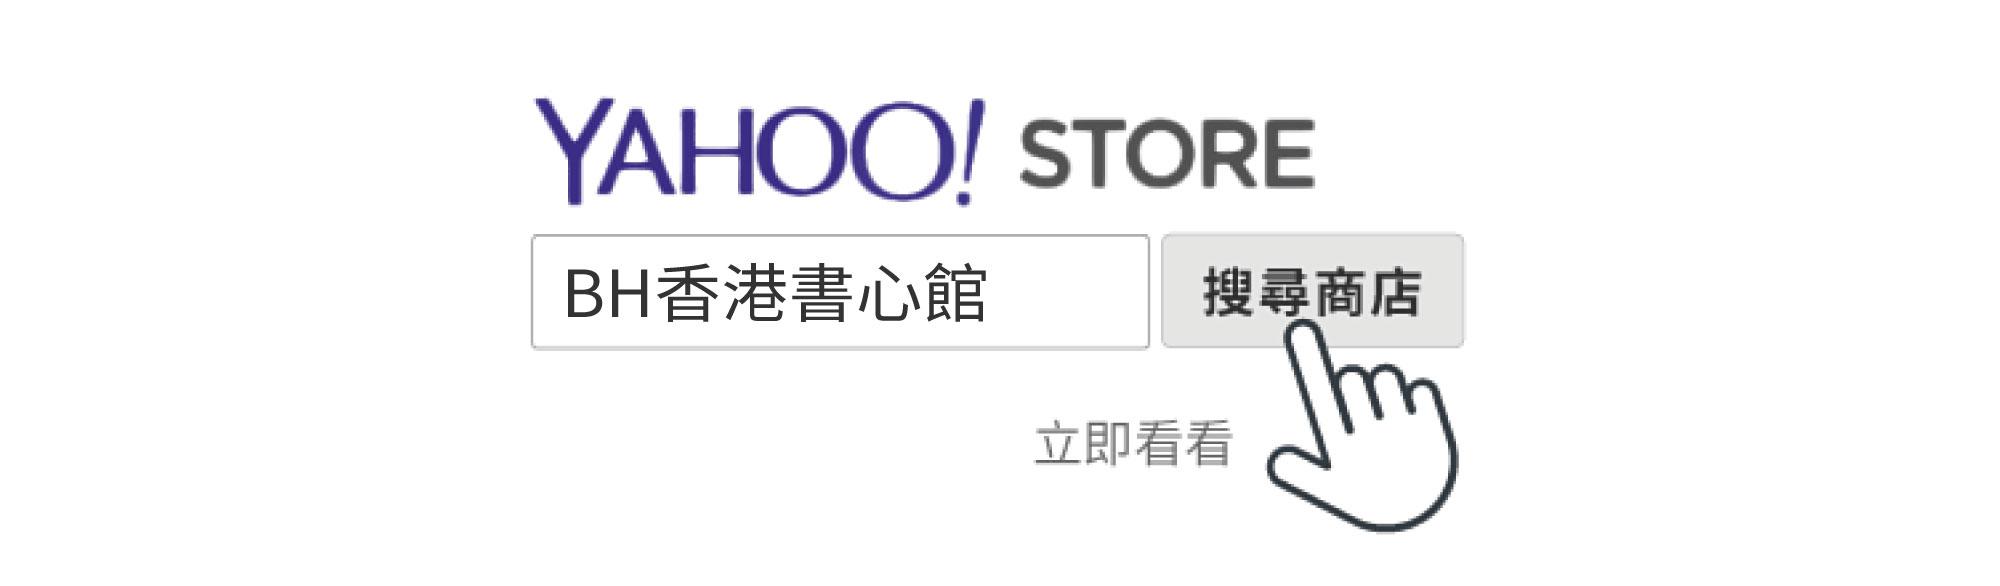 Yahoo!Store 香港書心館商店